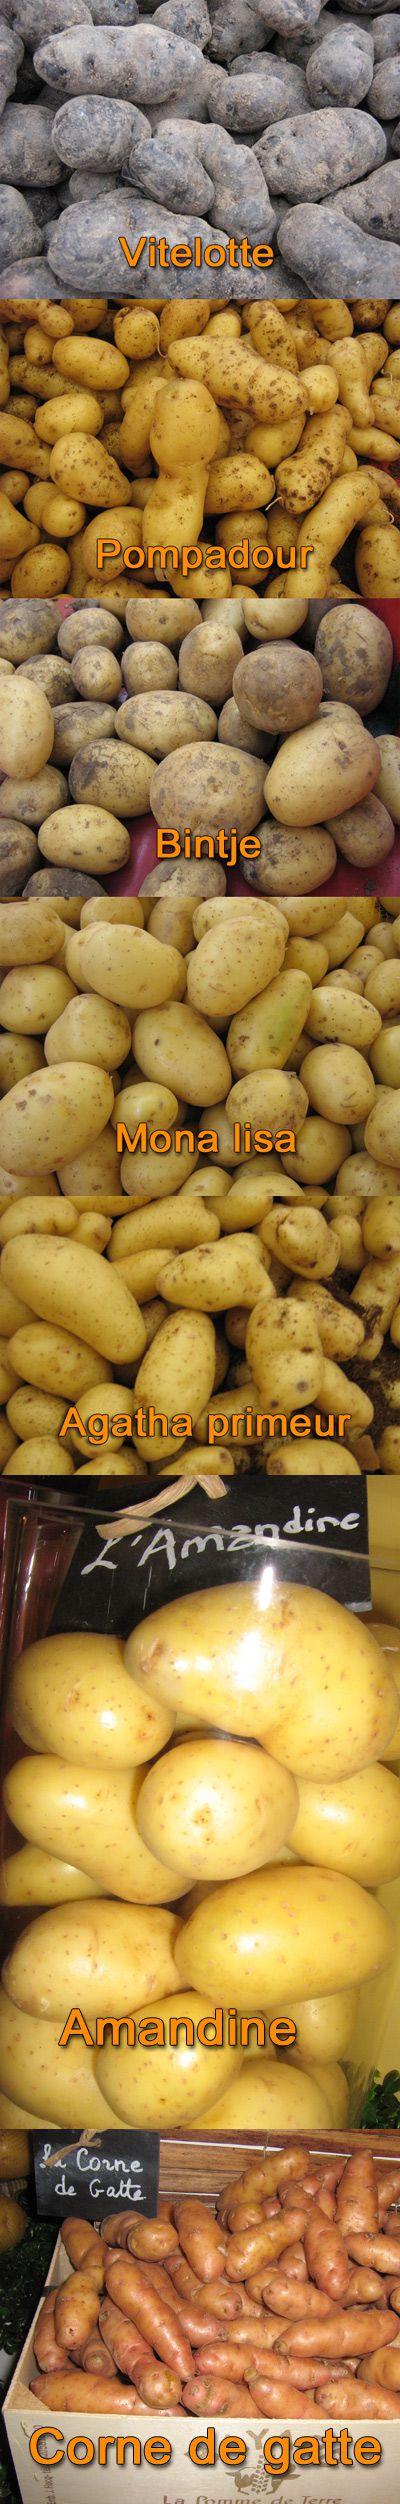 http://www.aftouch-cuisine.com/images/news/pommes-de-terre.jpg